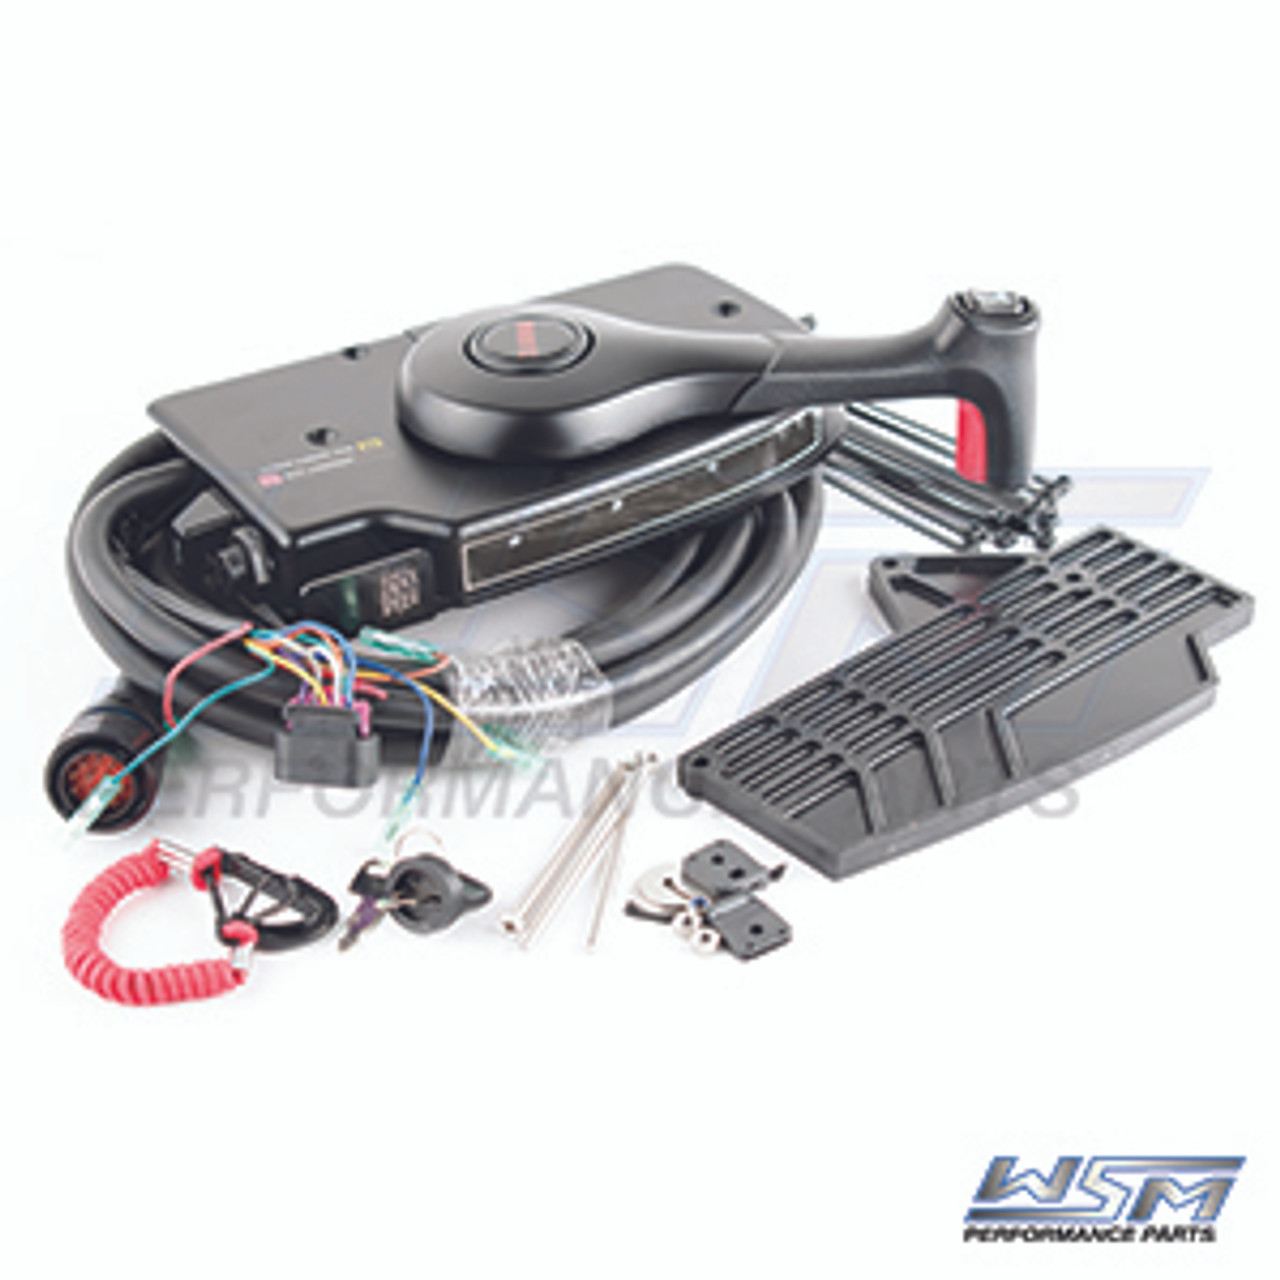 WSM Brand Control Box Assembly Mercury #OEM # 881170A13, 881170A14